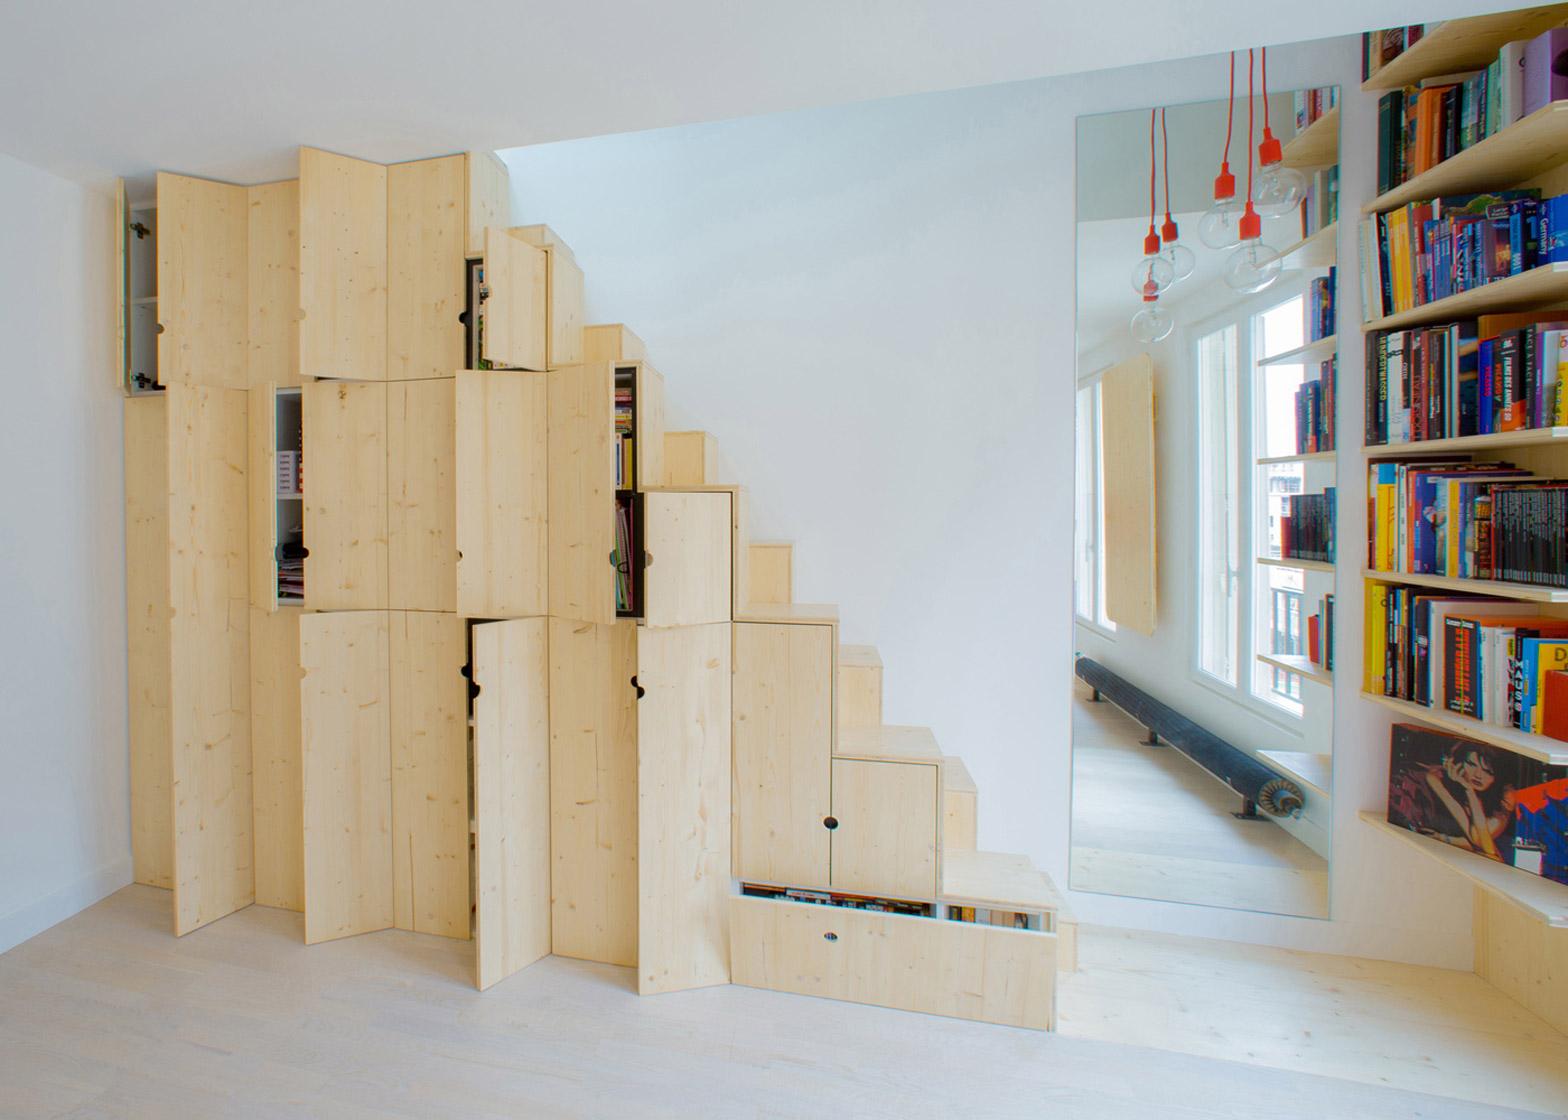 architecture_10_compact_solutions_design_studia_interiors_osnovadesign_osnova_poltava_06